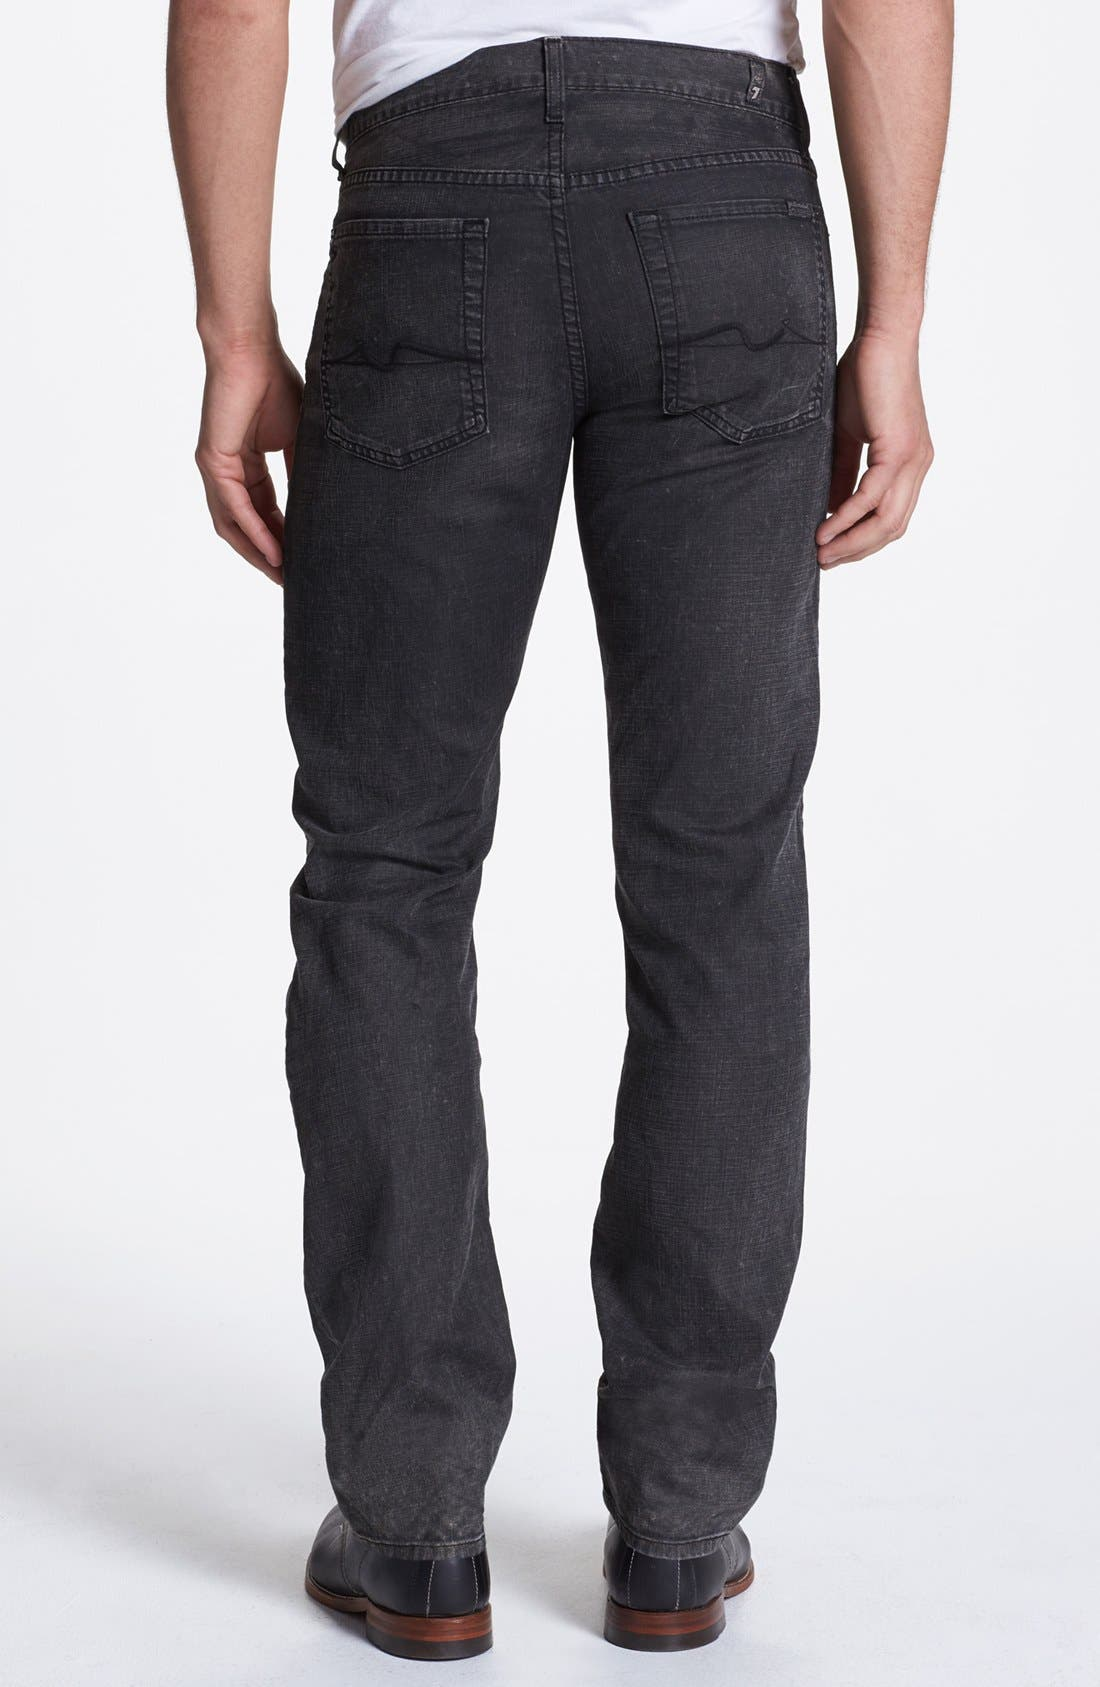 Main Image - 7 For All Mankind® 'Slimmy' Slim Fit Jeans (Seven Mile Lane)